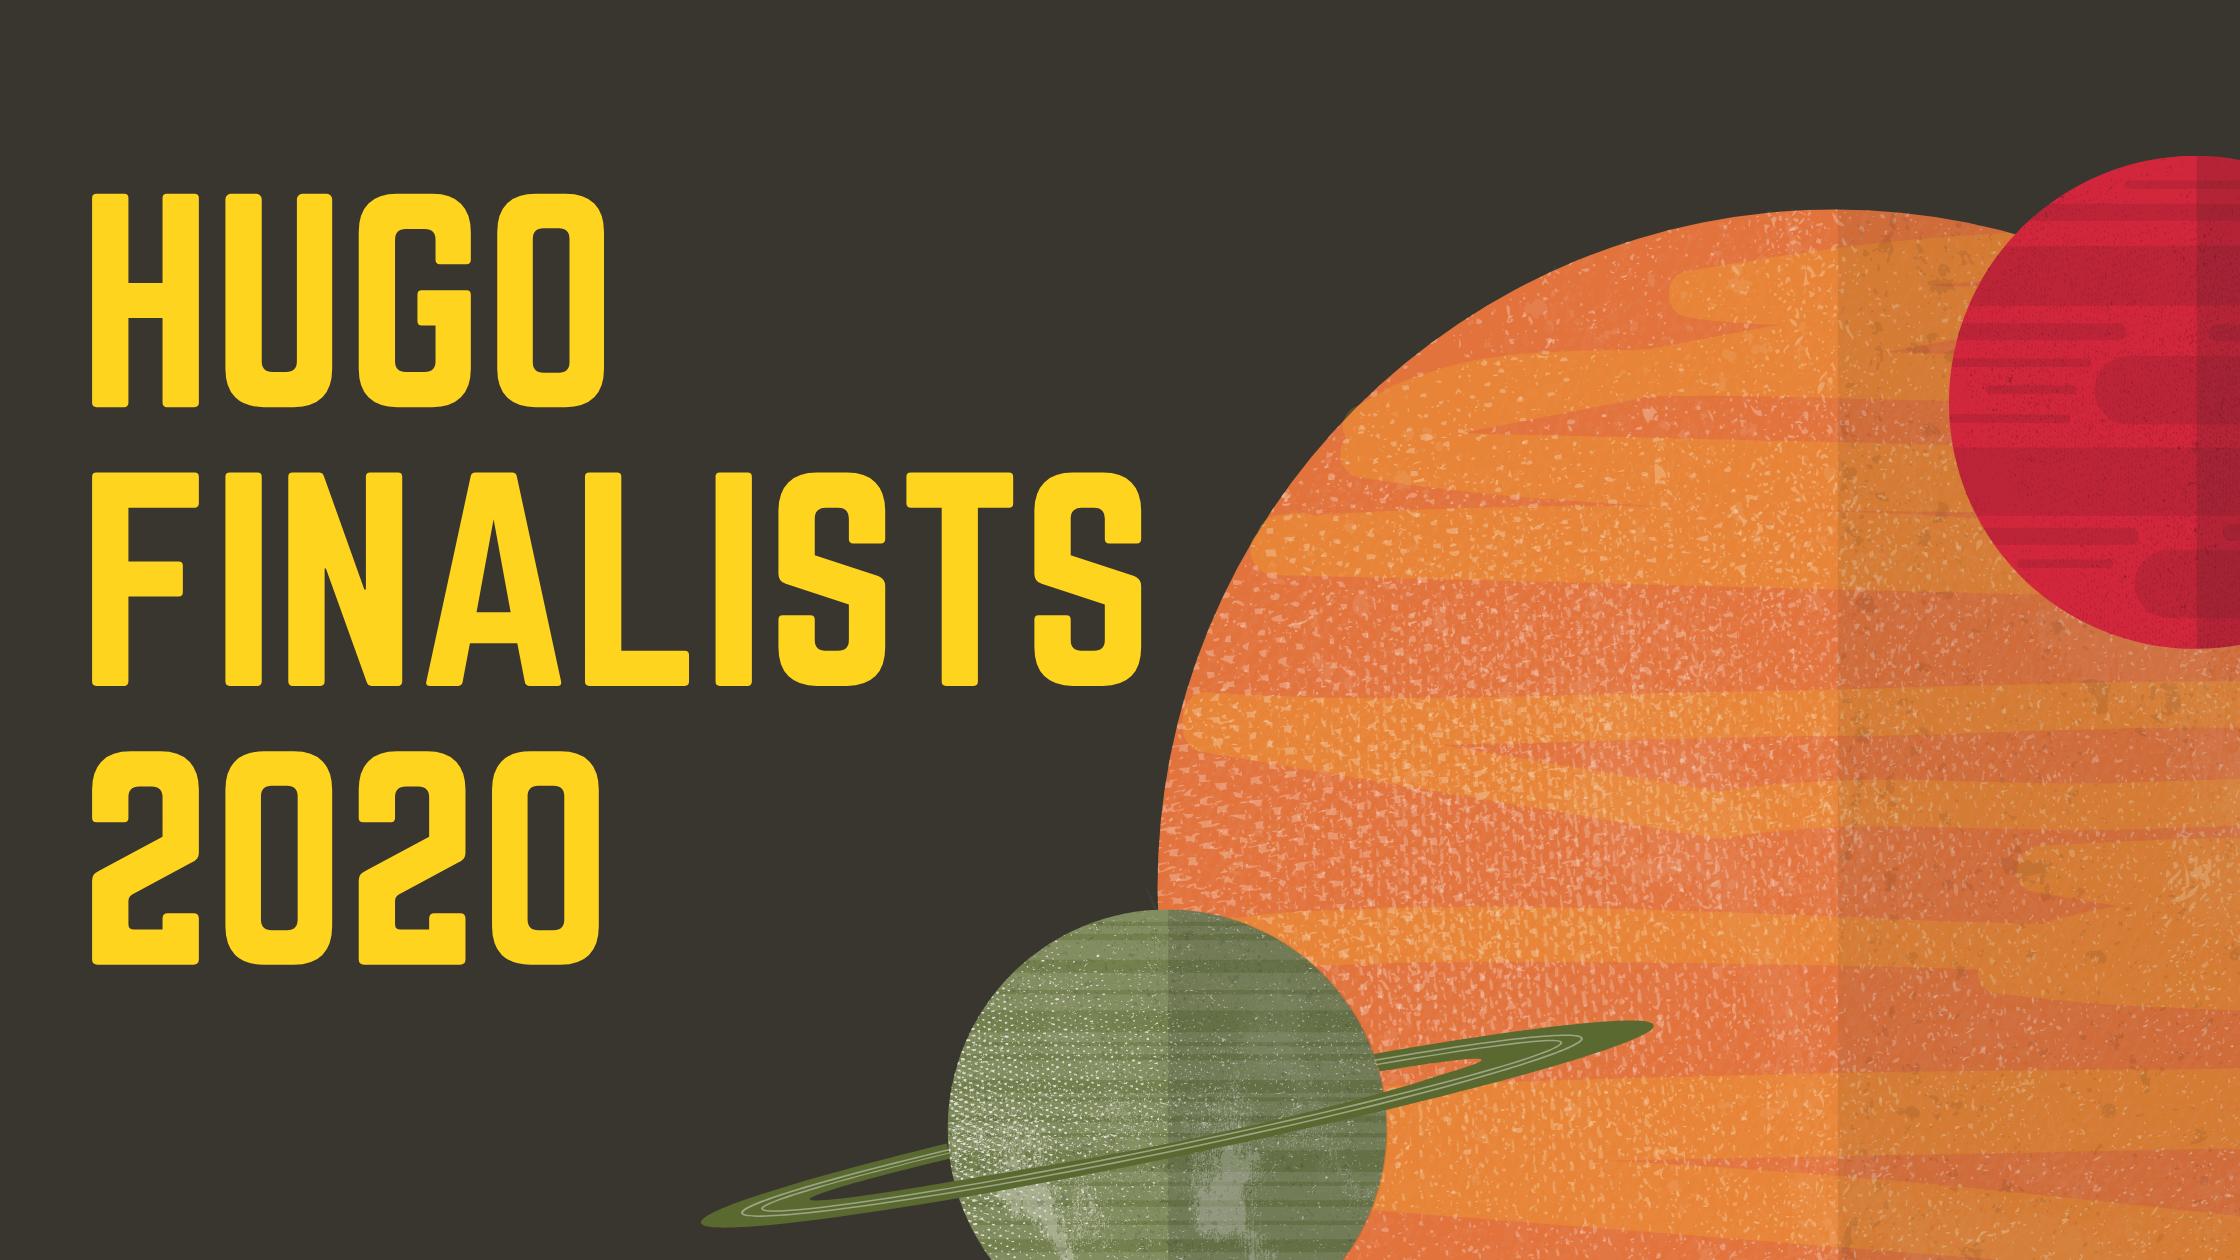 hugo finalists